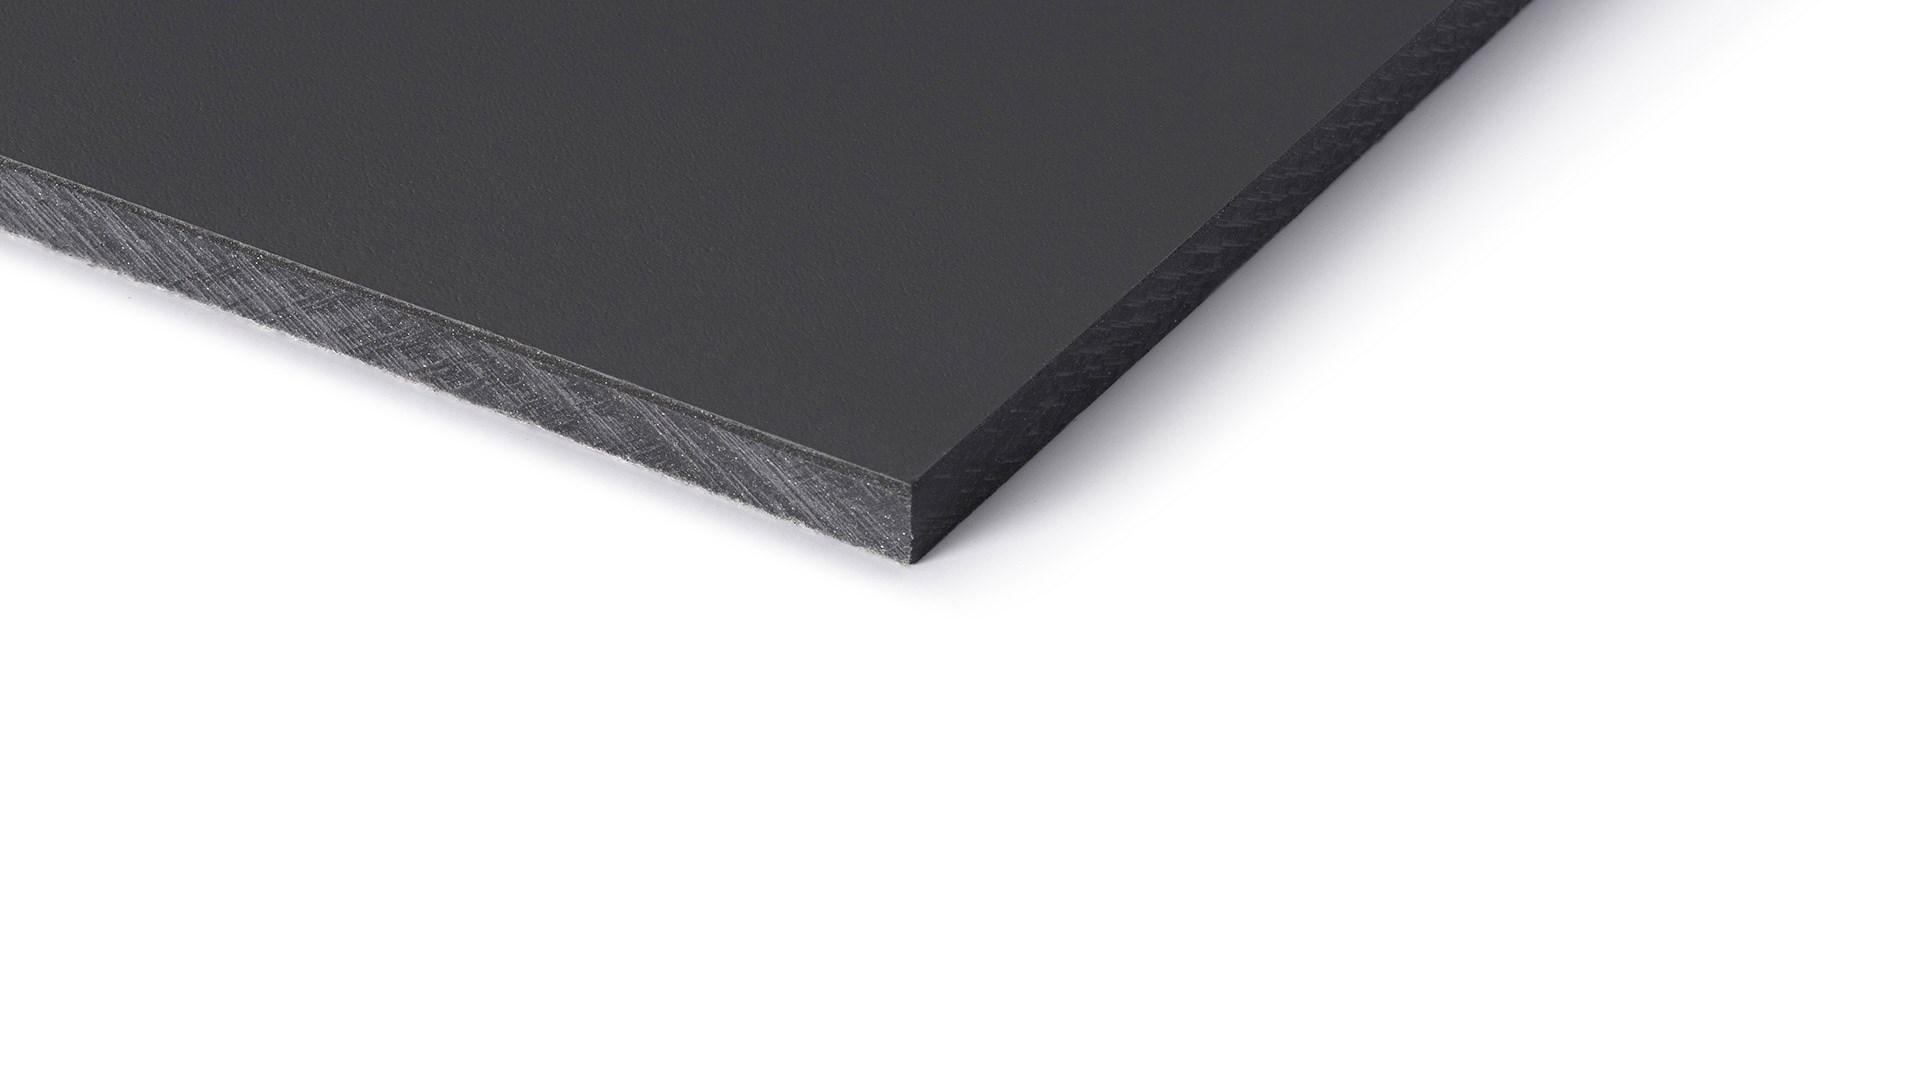 cembrit-solid-kolor-070-plyta-wzornik-probka